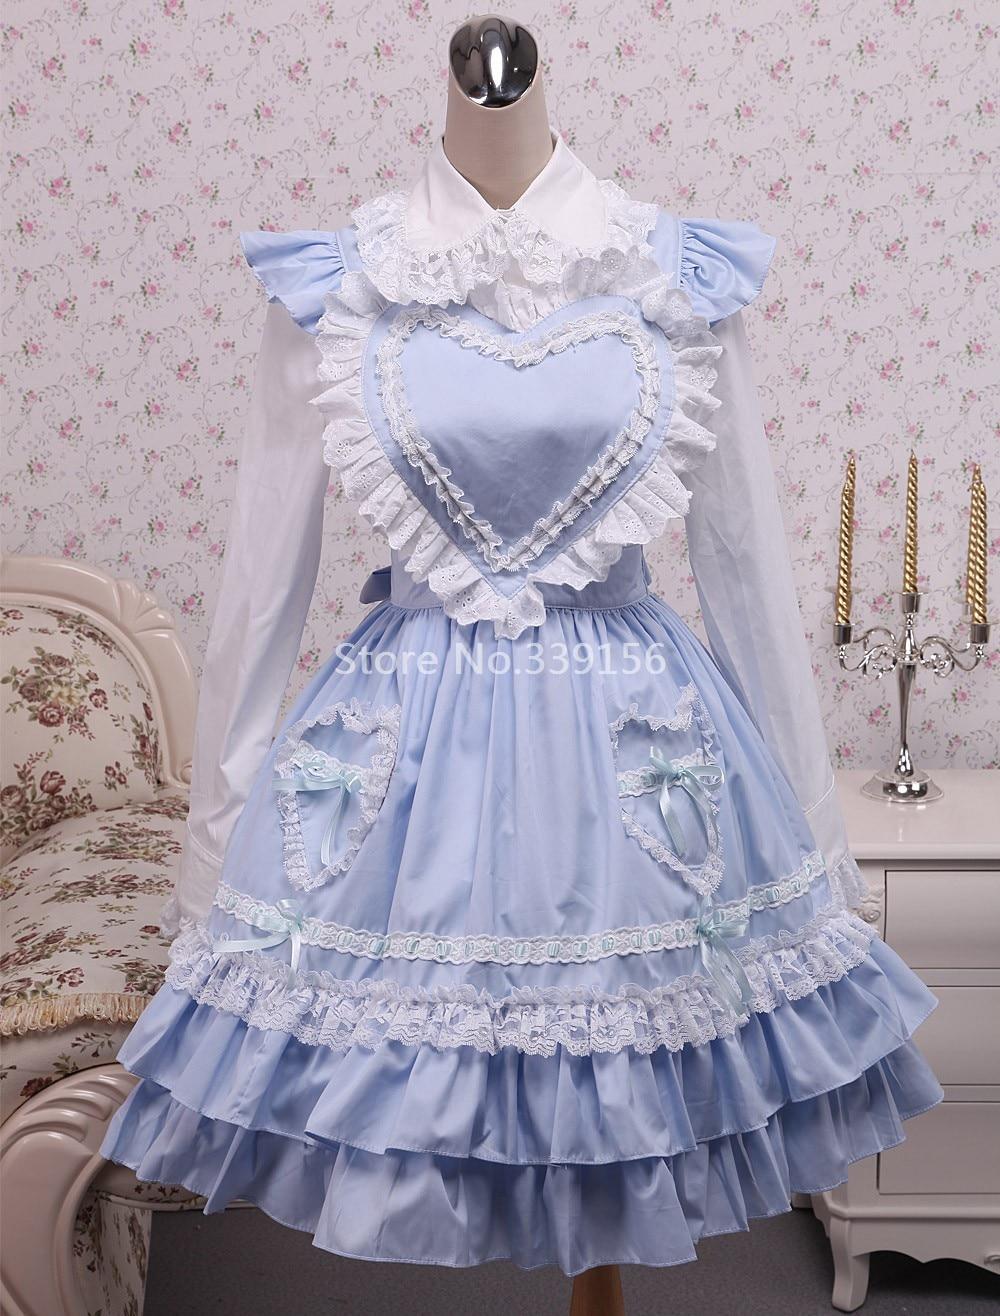 New Fashion Hot Sale Cotton White Lolita Blouse And Blue Sweet Lolita Dress